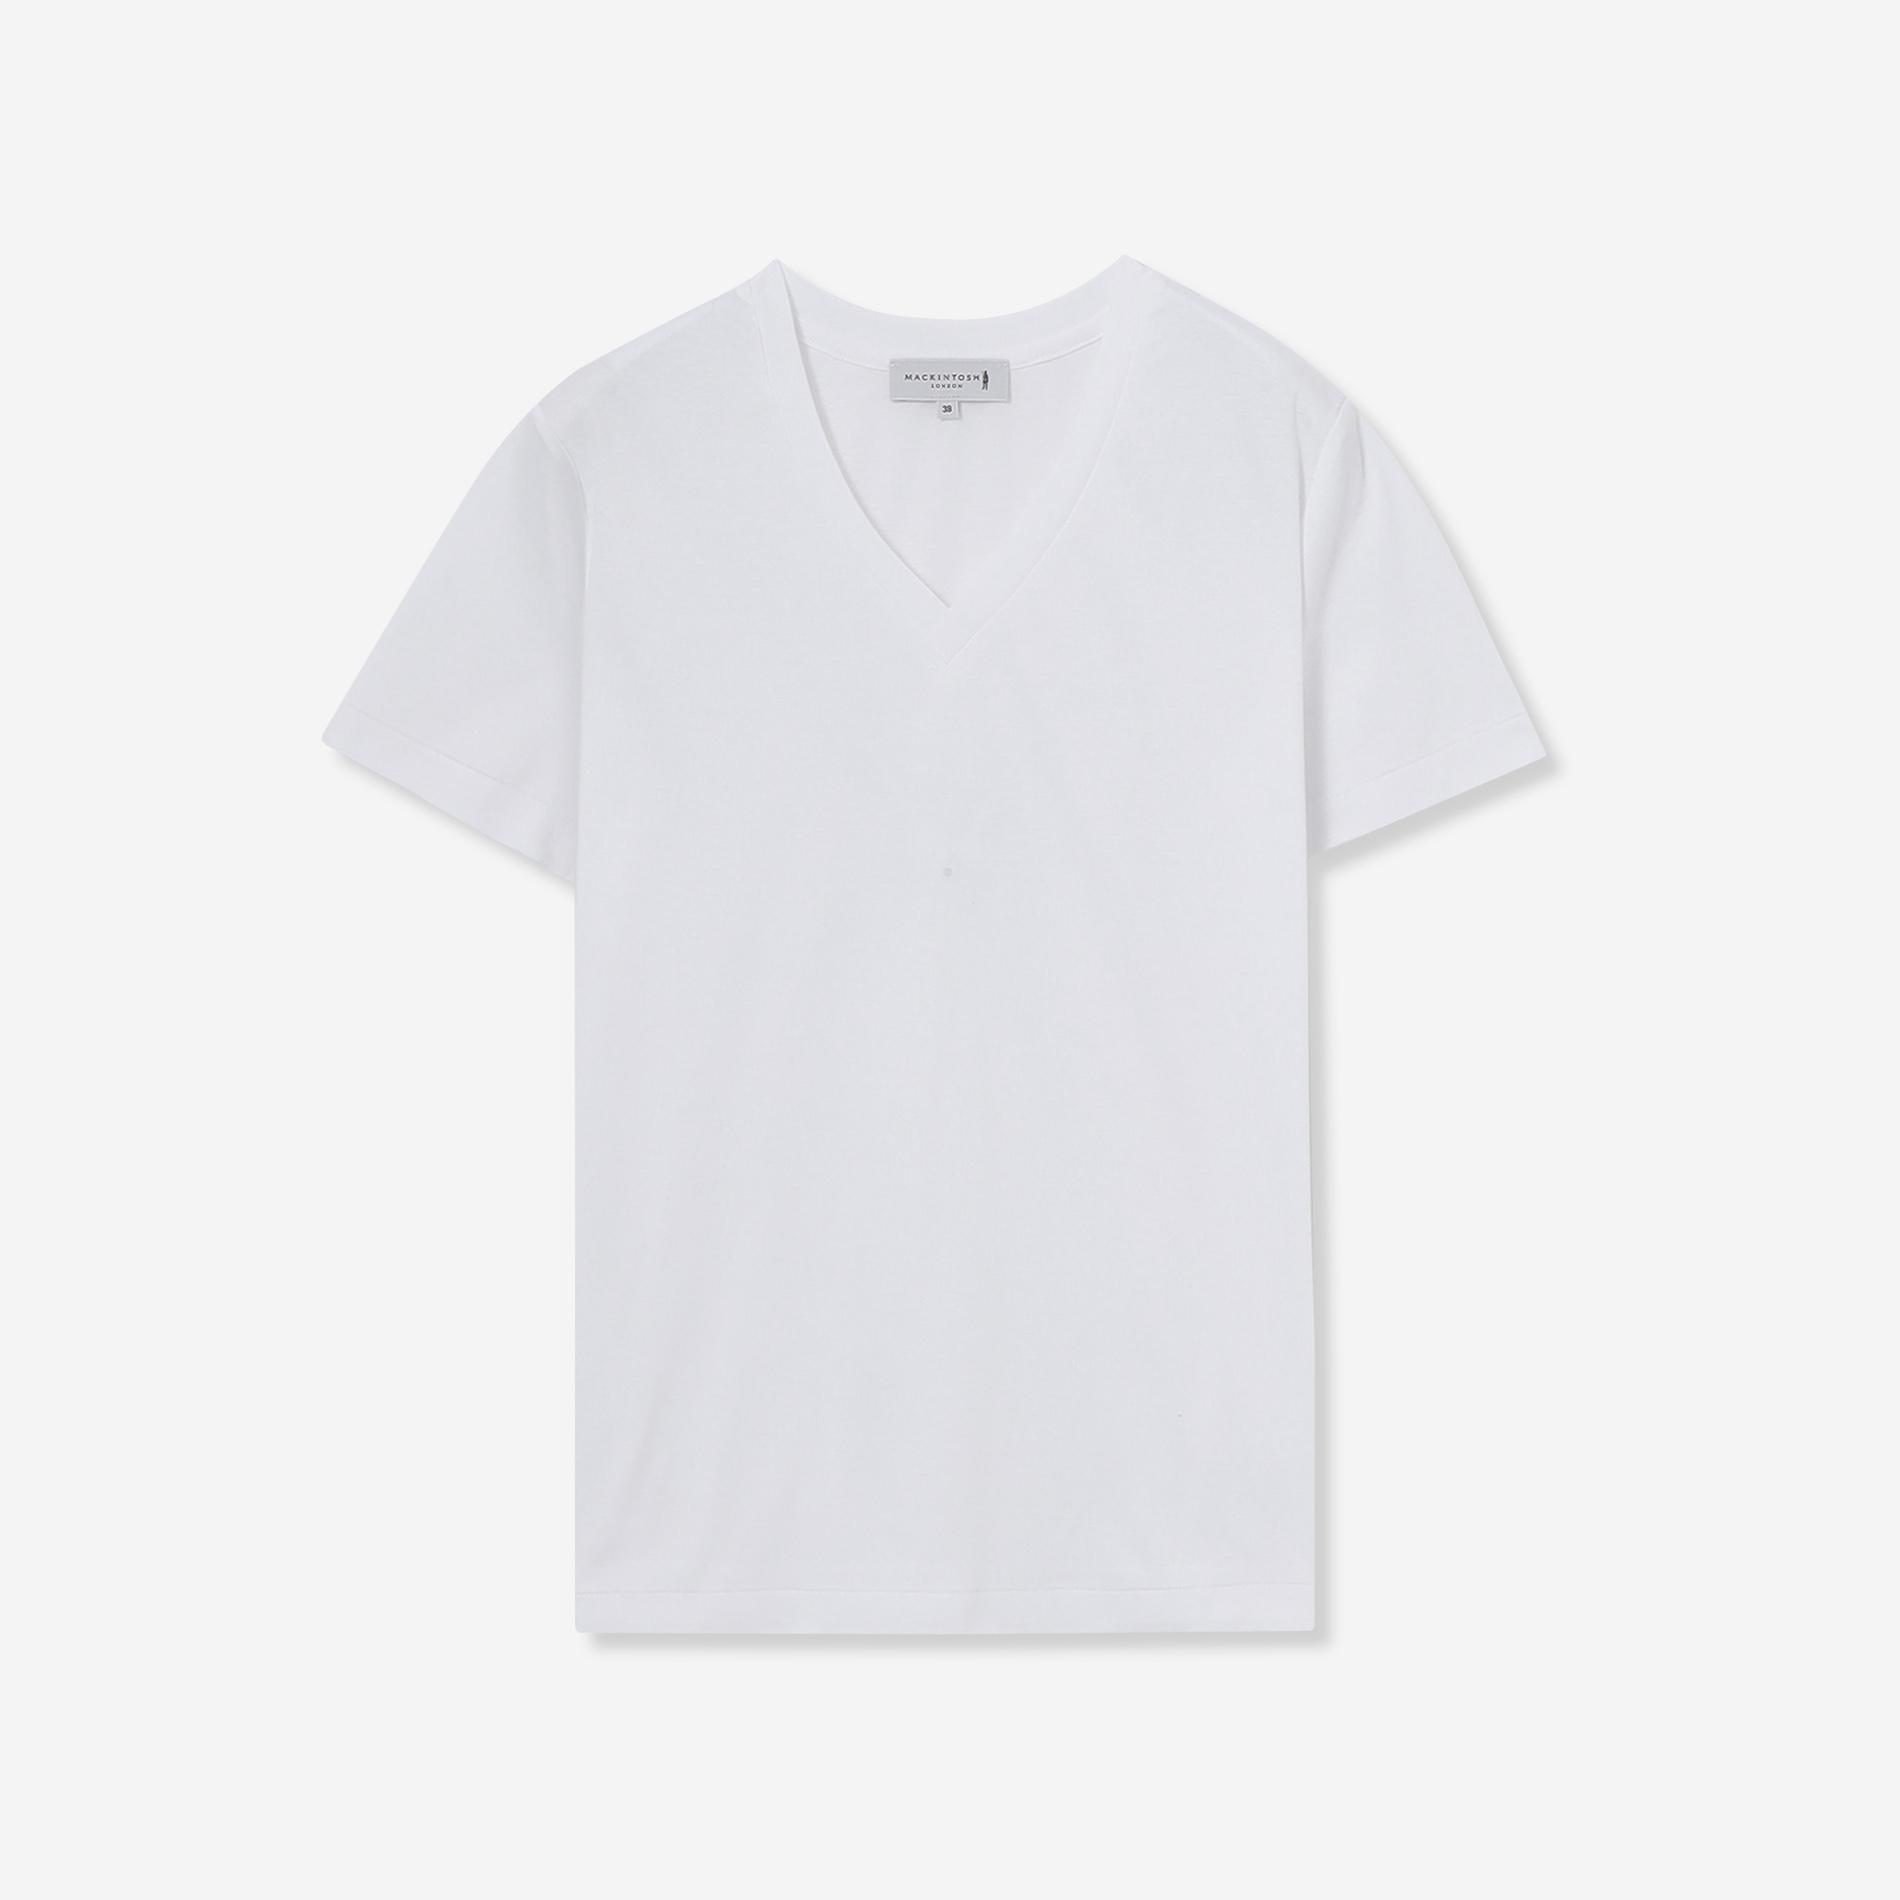 【The Essential Collection】スーピマコットンVネック半袖Tシャツ